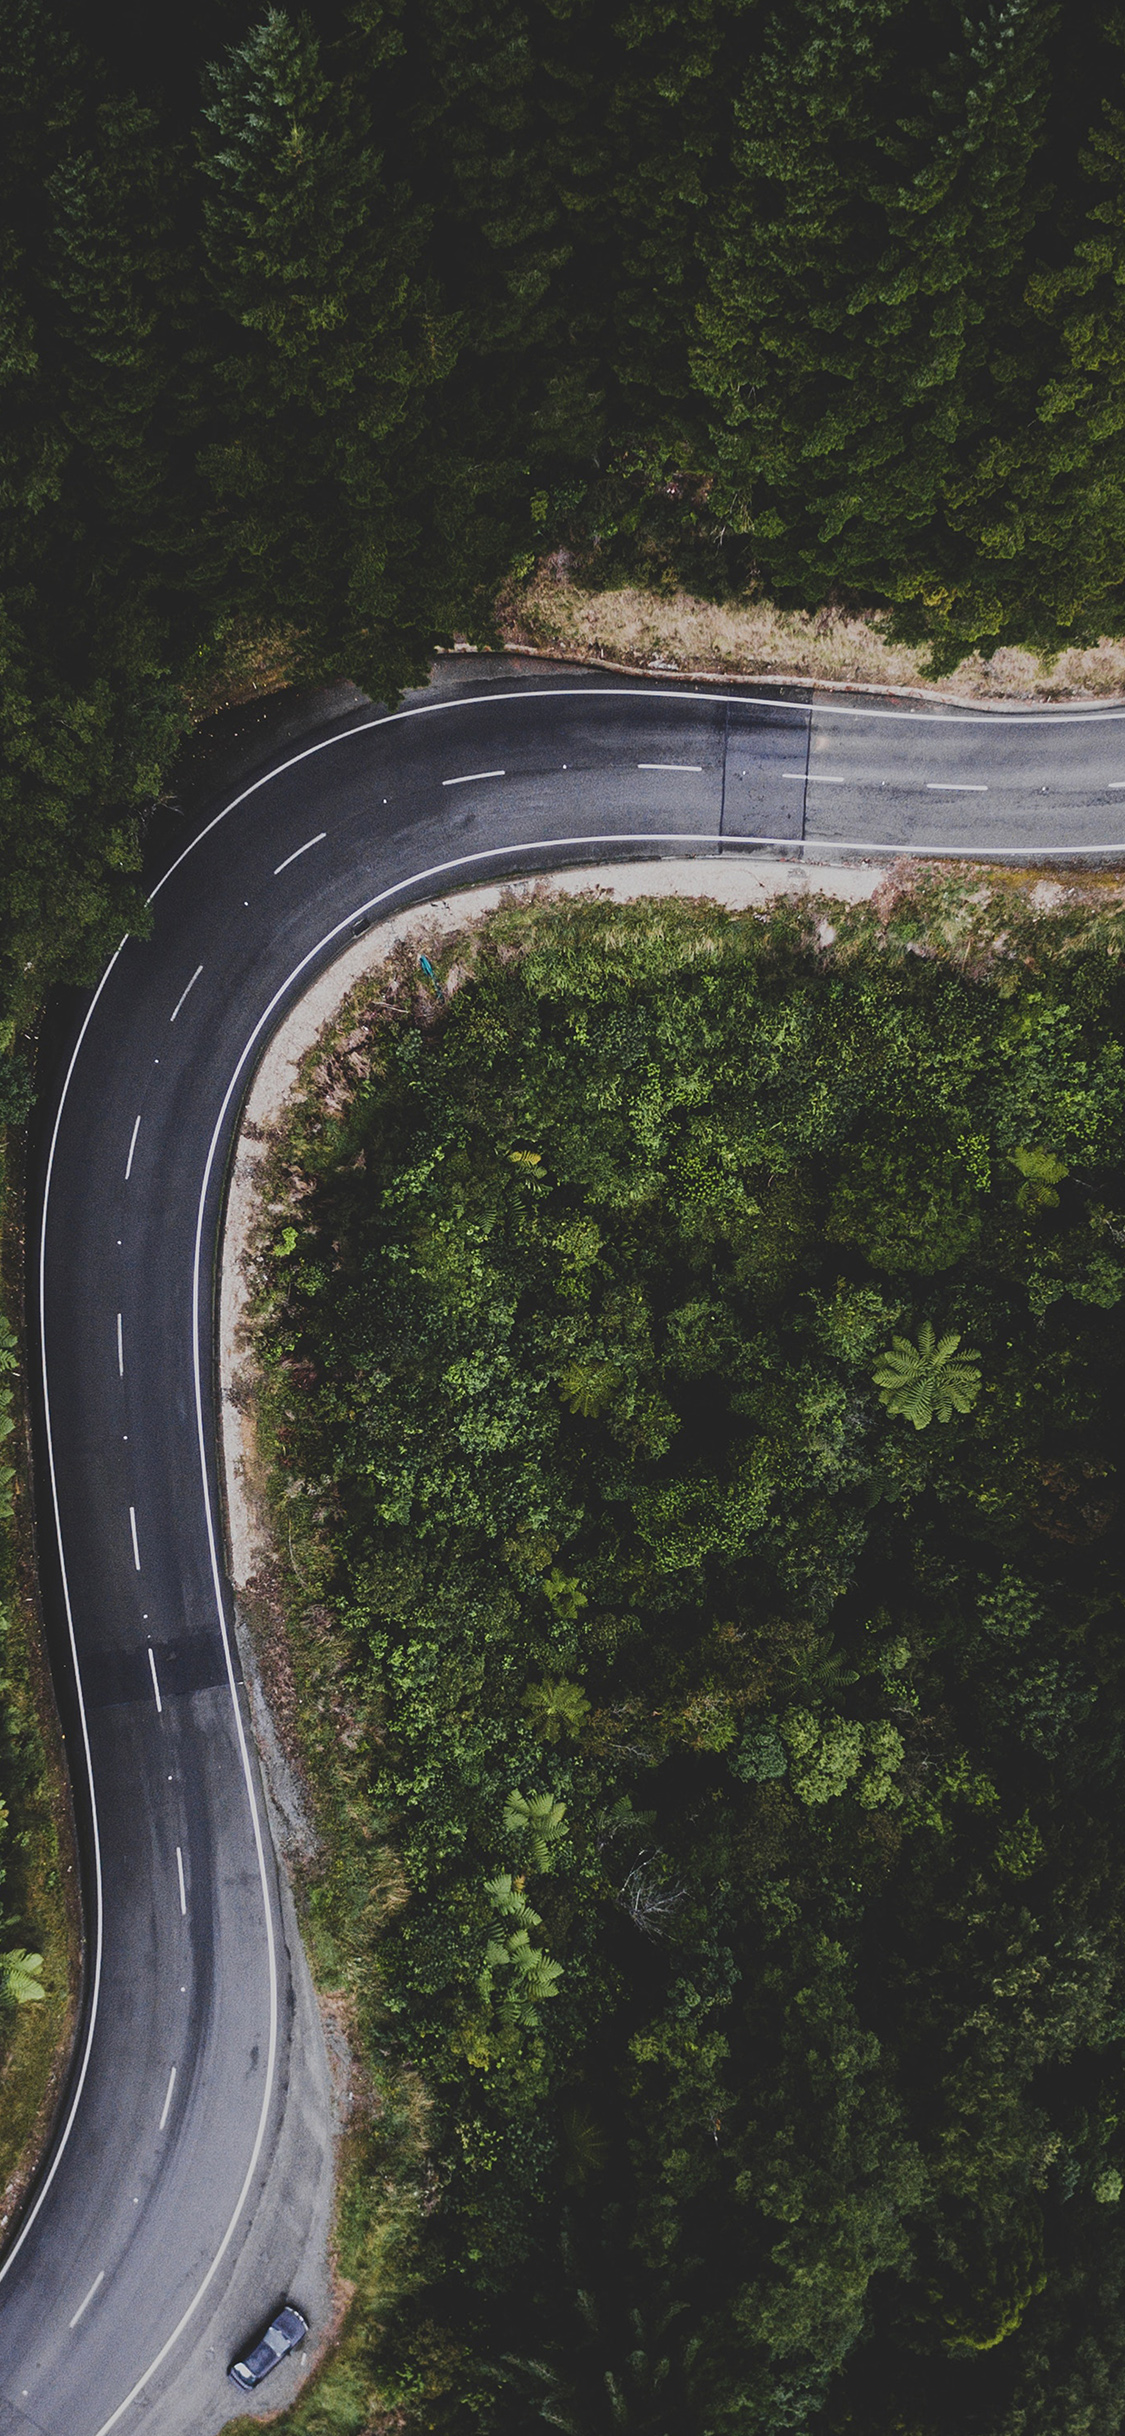 street-road-mountain-nature-iphone-X